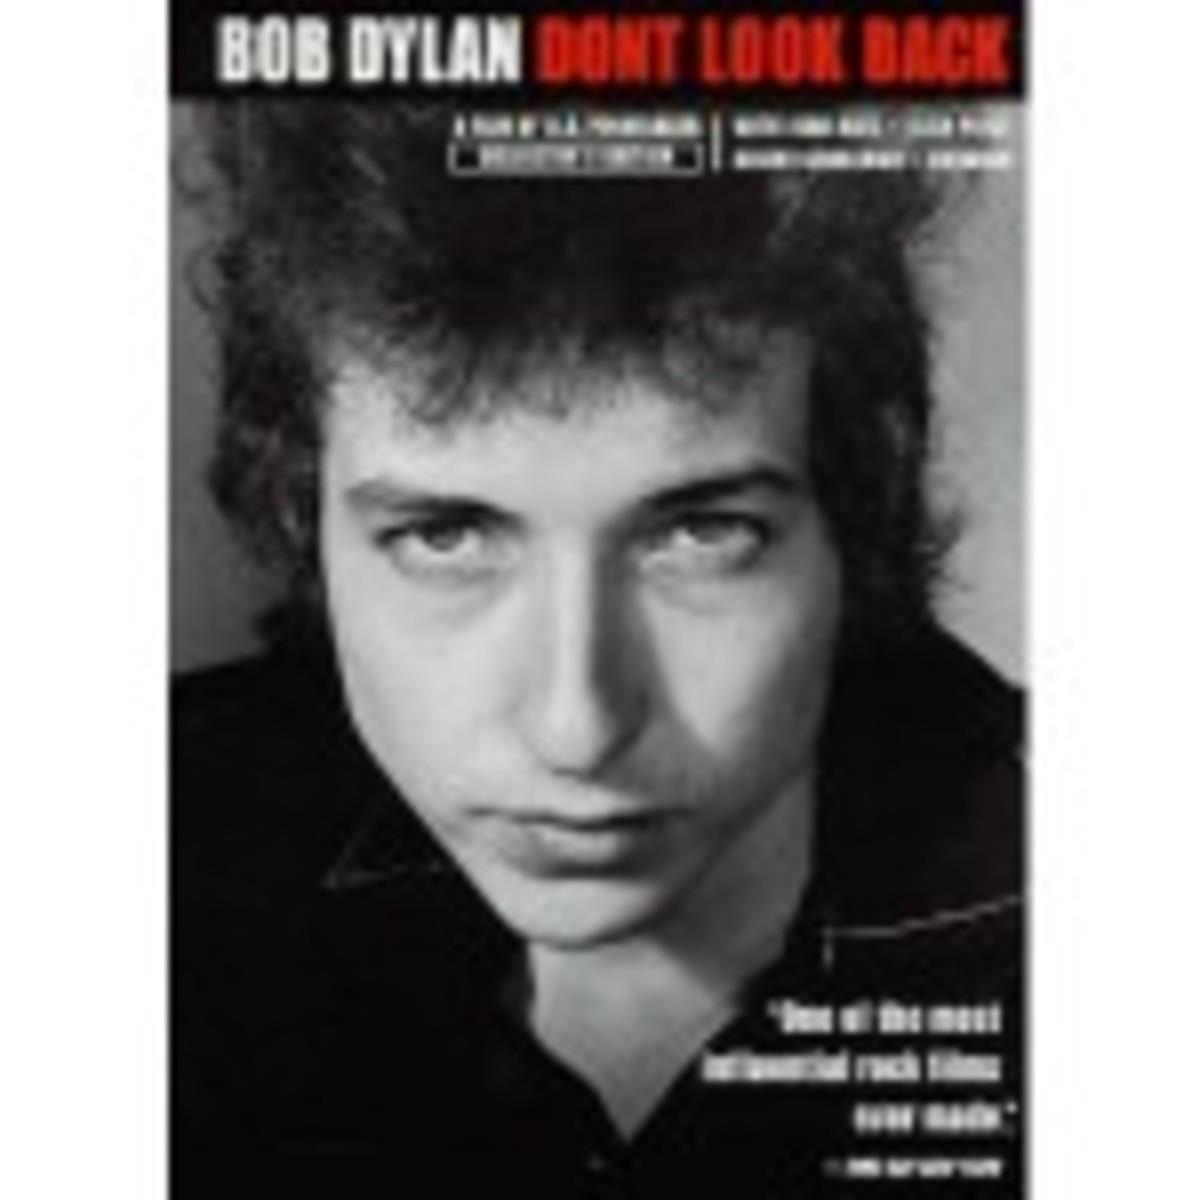 Bob Dylan_Don't Look Back